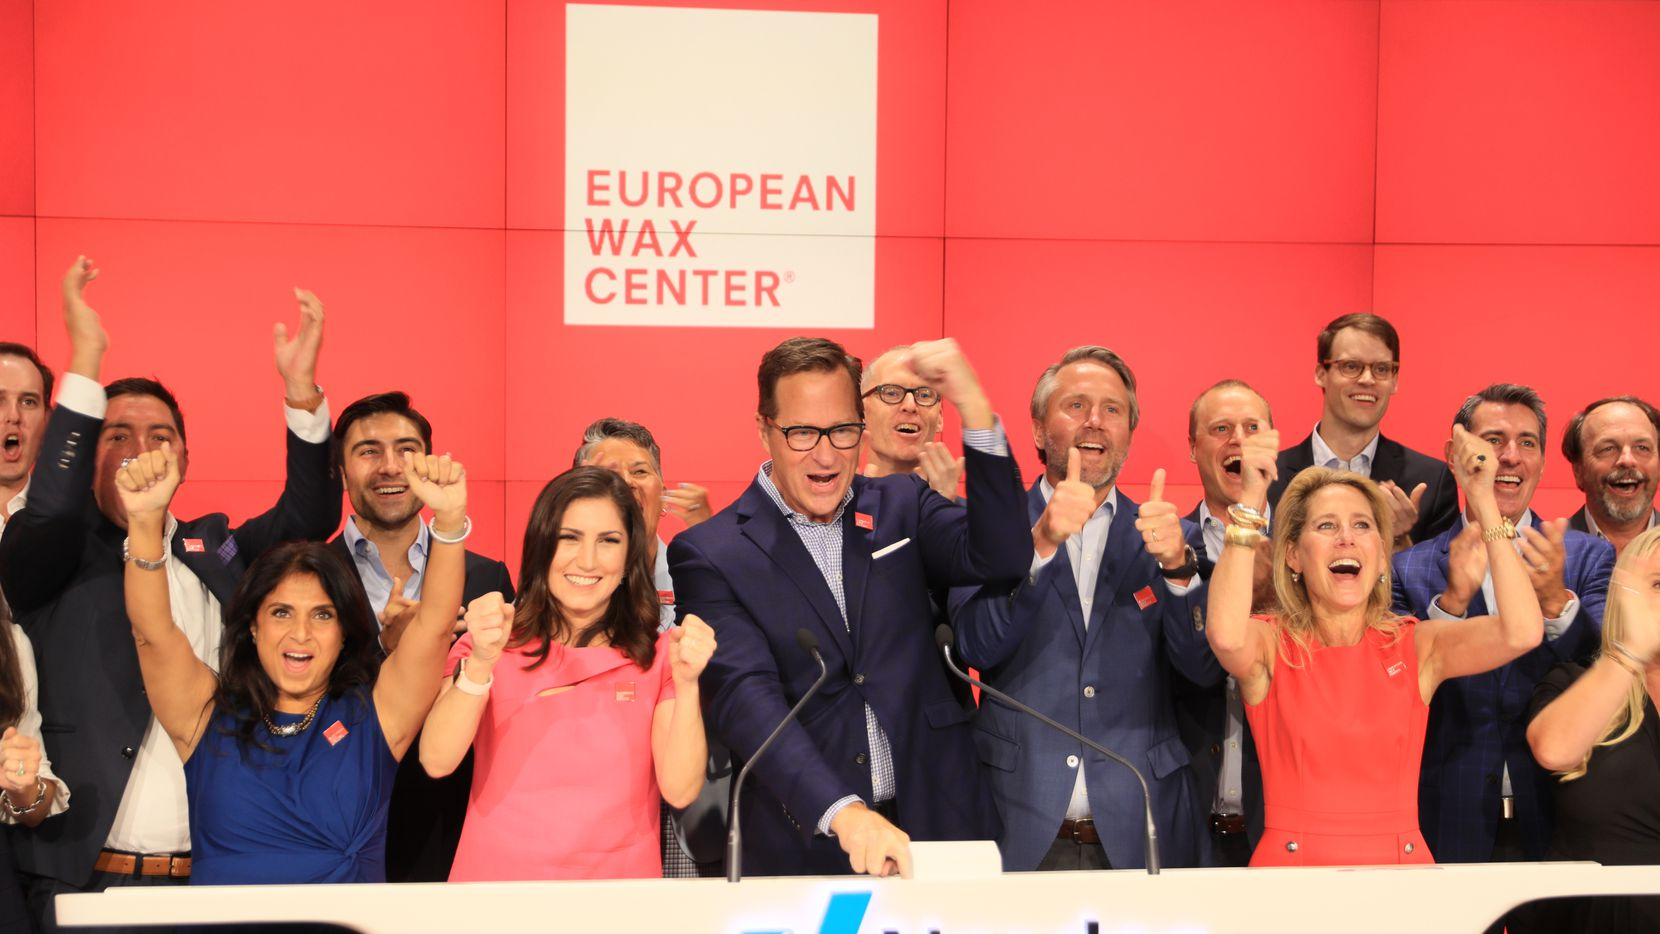 European Wax Center CEO David Berg (Center) celebrated the start of trading for EWCZ shares on the Nasdaq Thursday, Aug. 5, 2021.